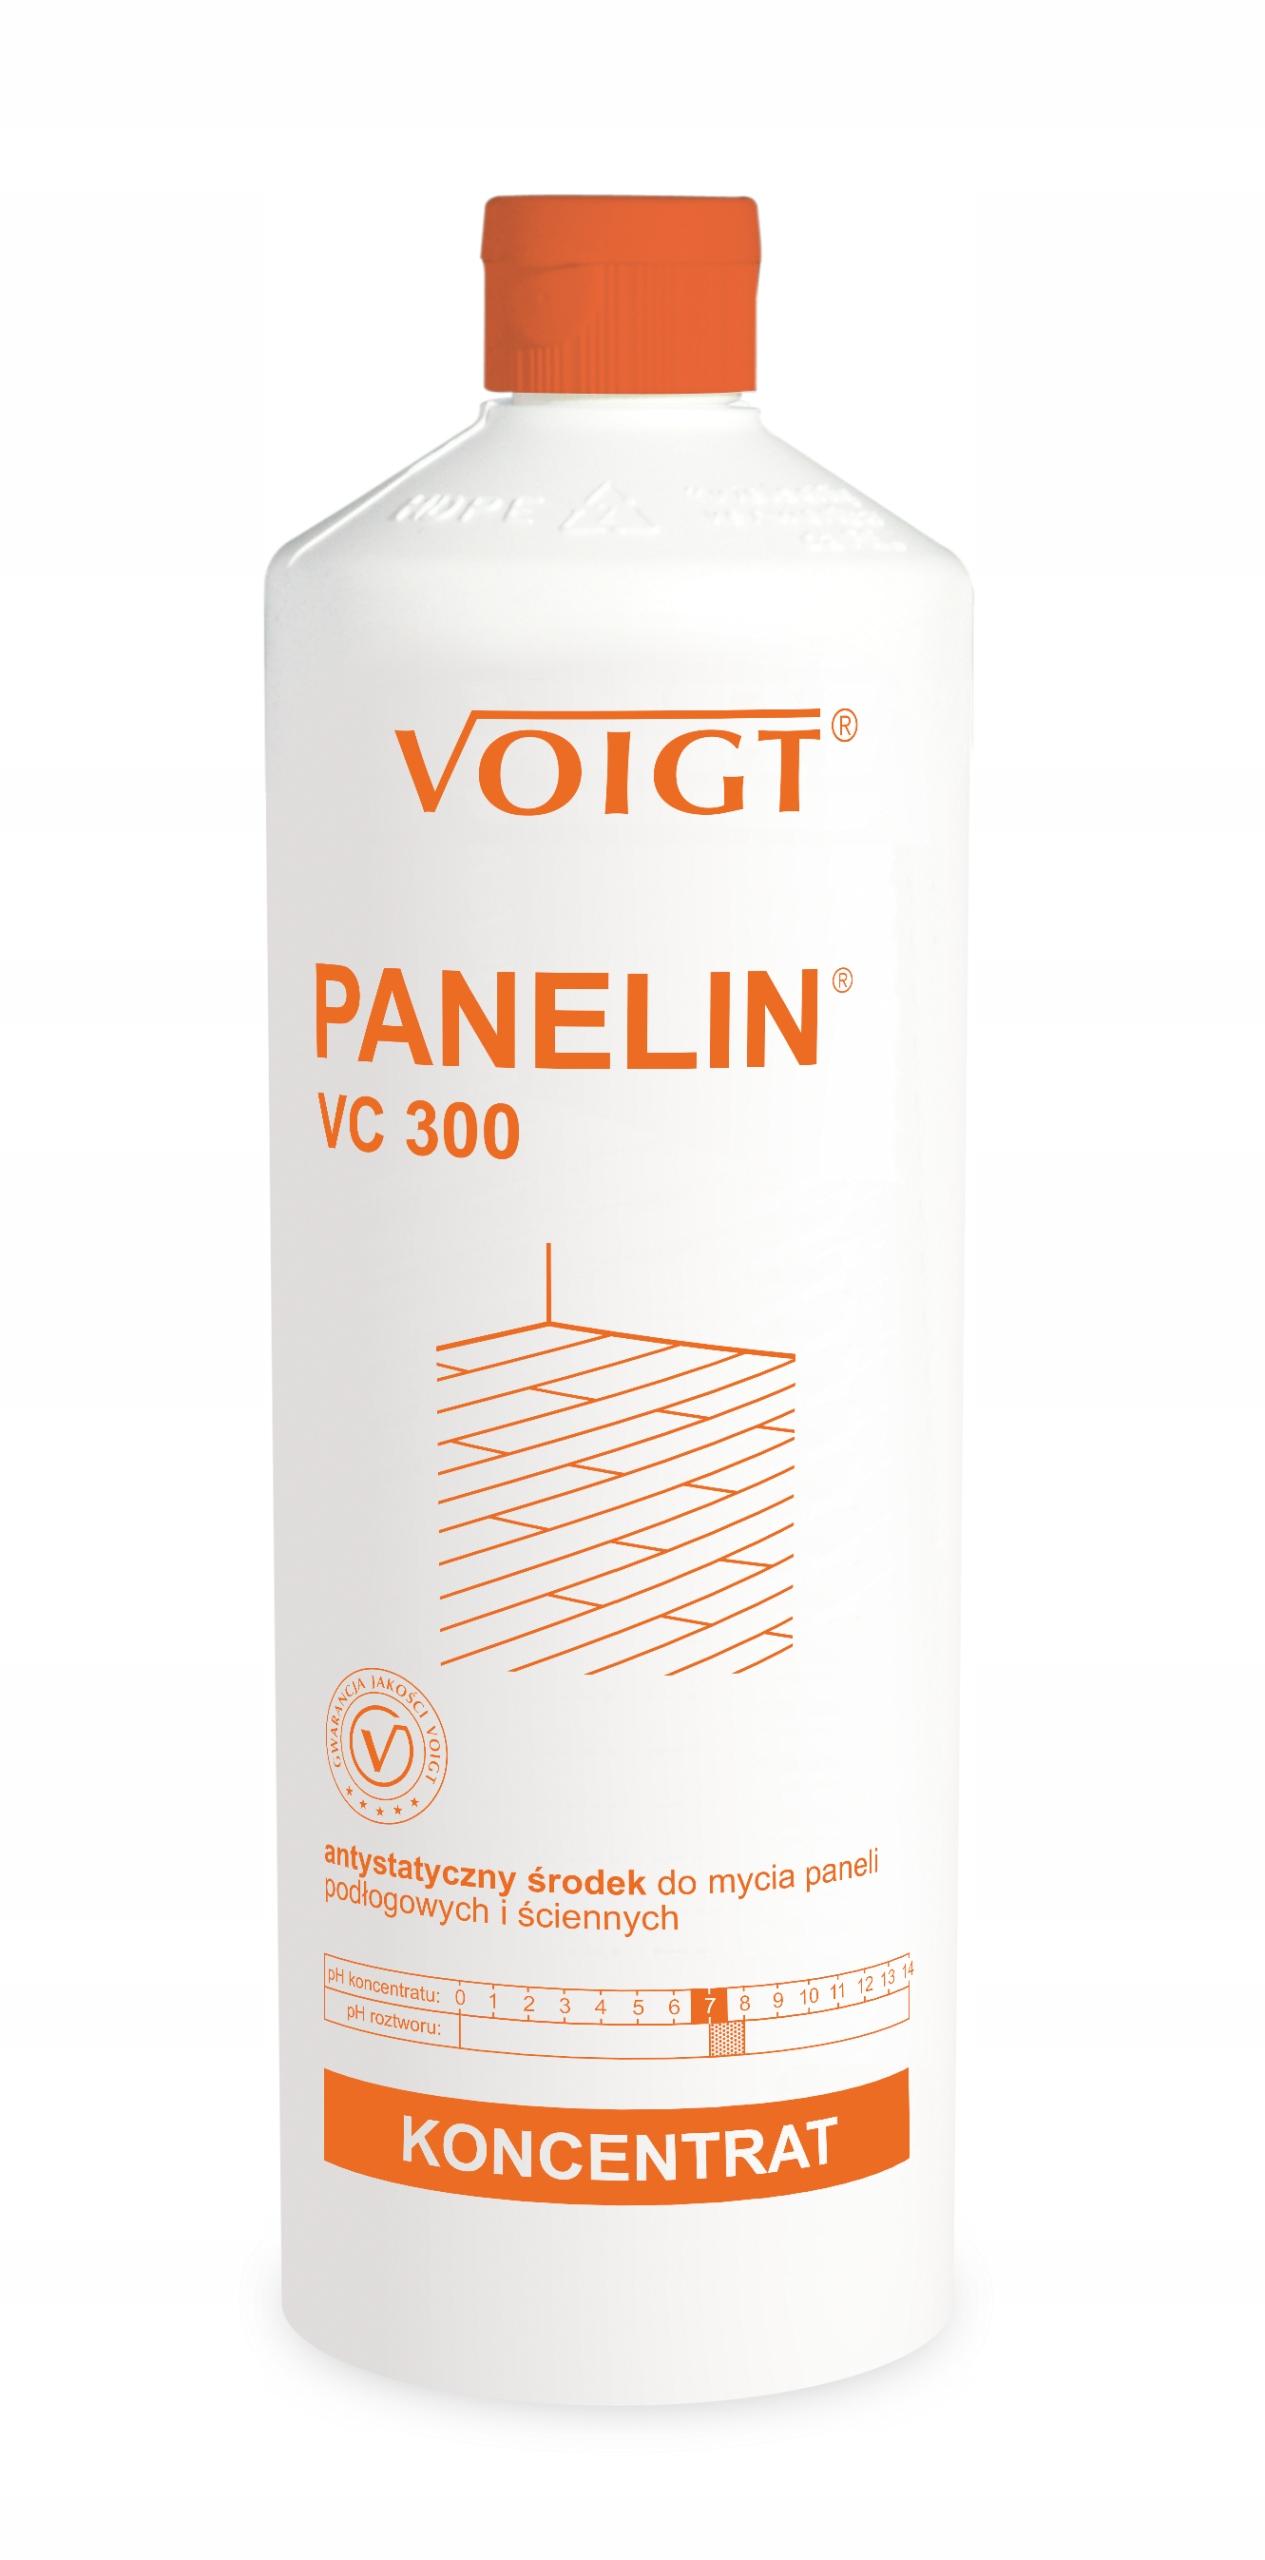 Voigt PANELIN VC 300 для мытья 1L концентратных панелей